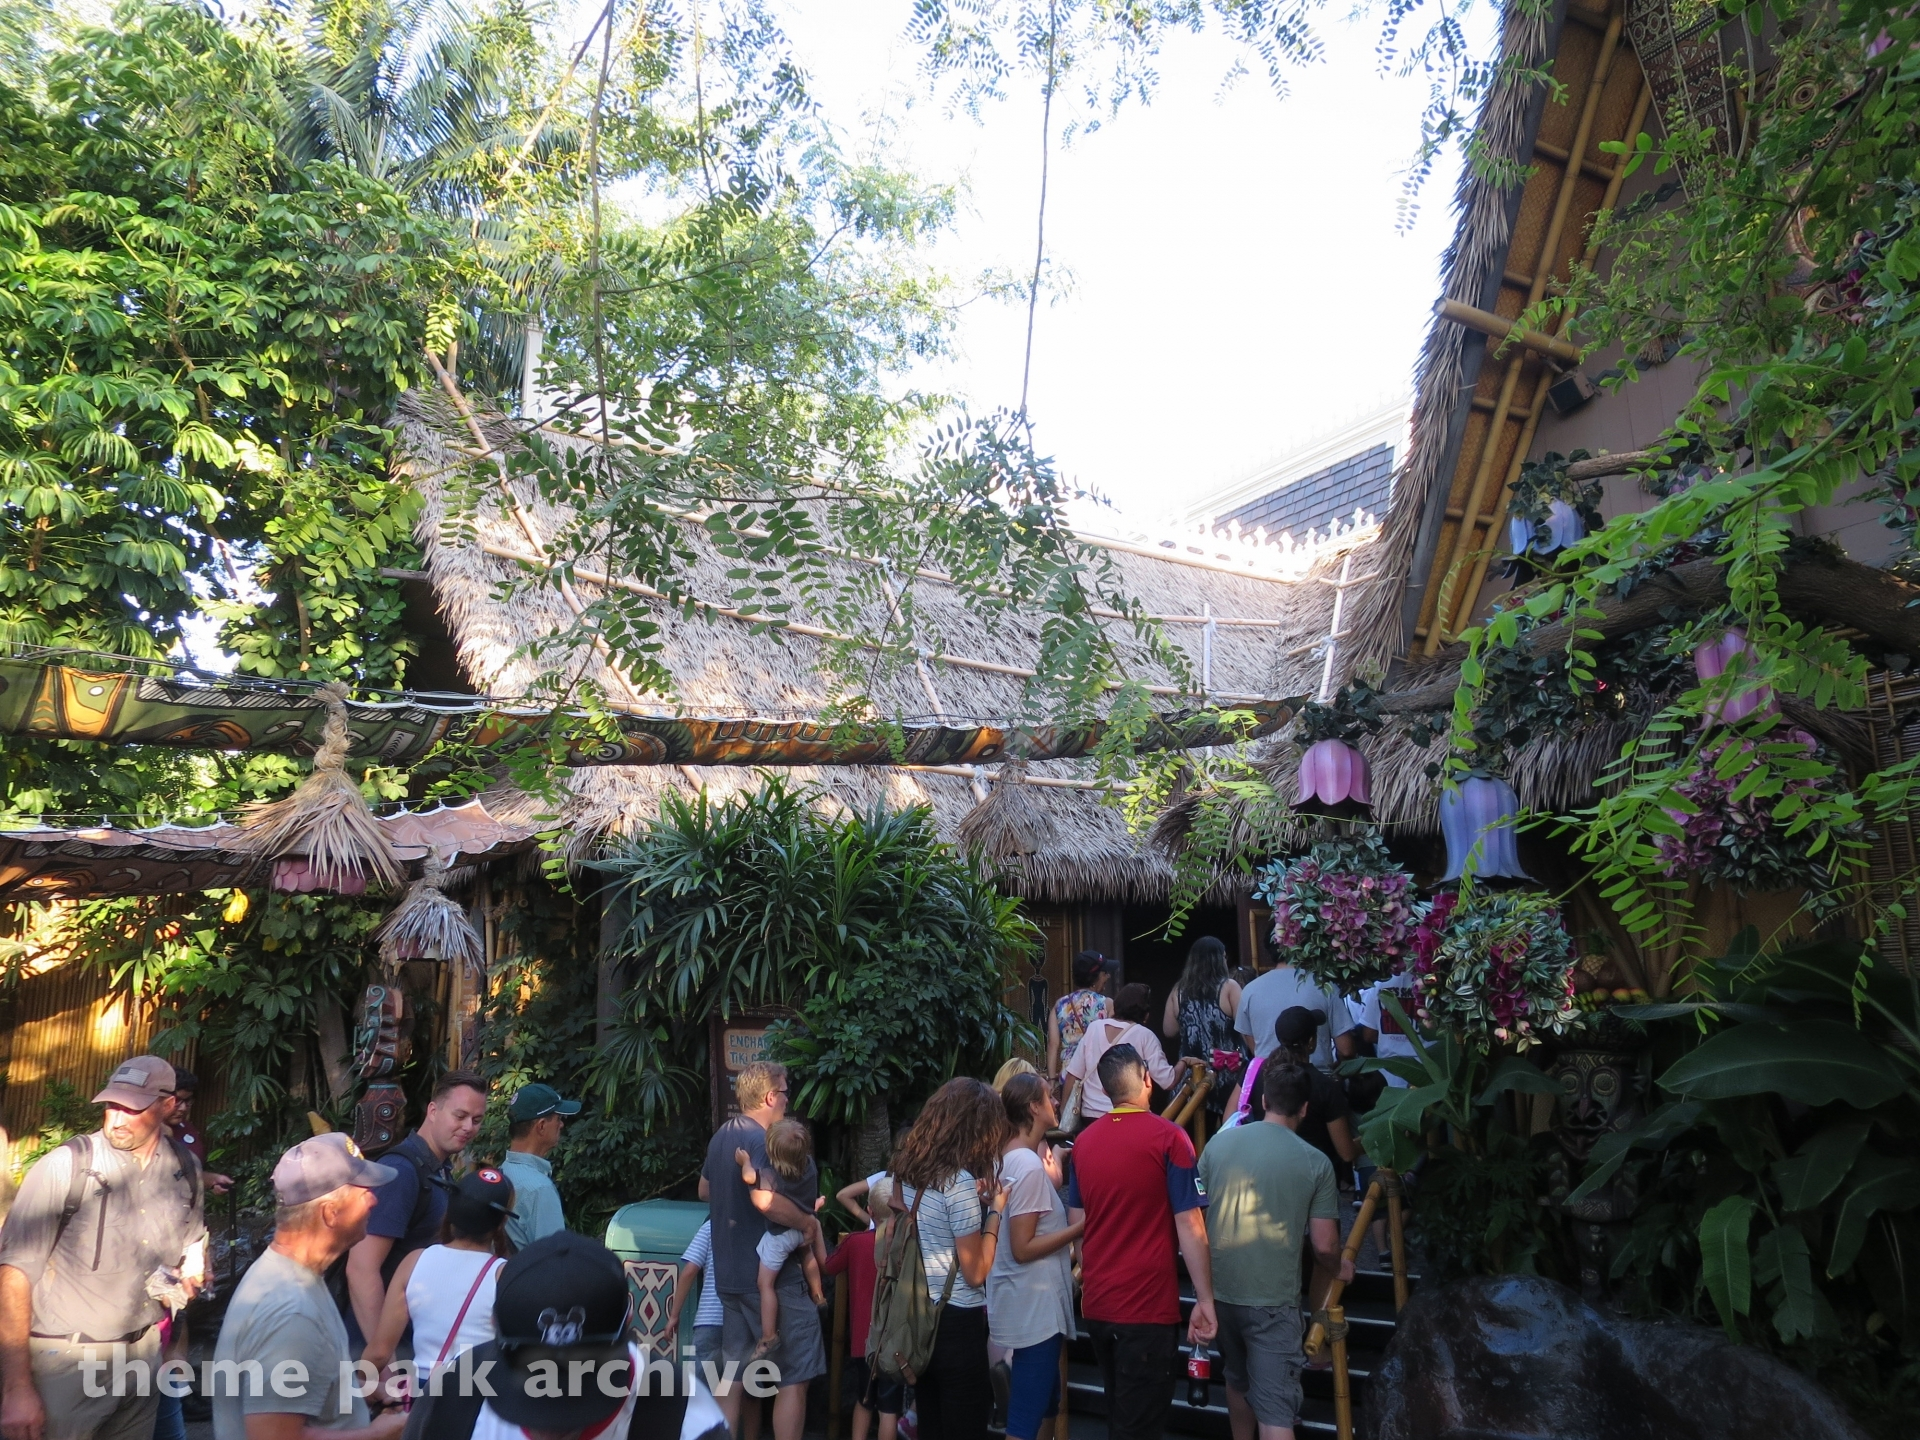 Enchanted Tiki Room at Disneyland